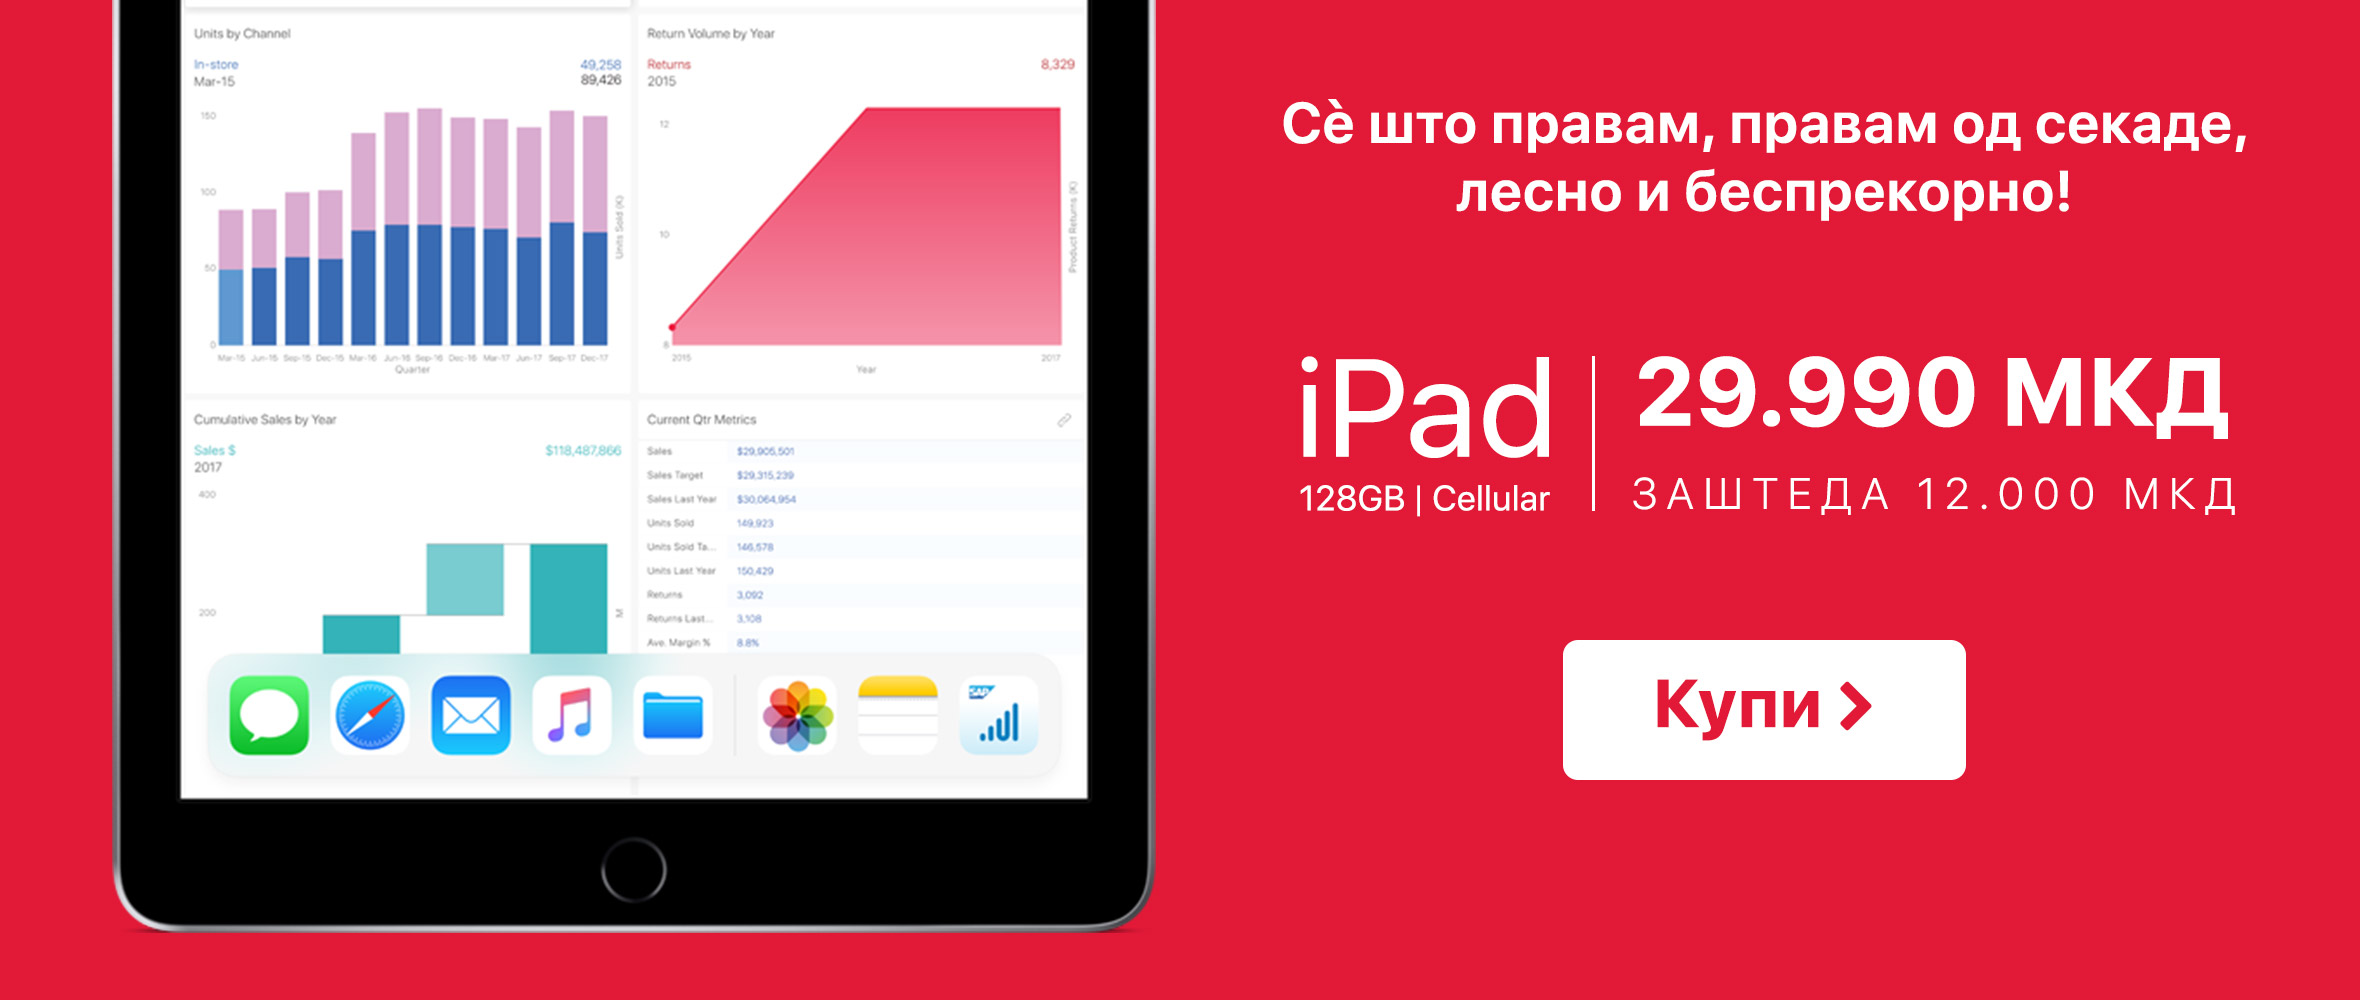 iPad Cell 128GB